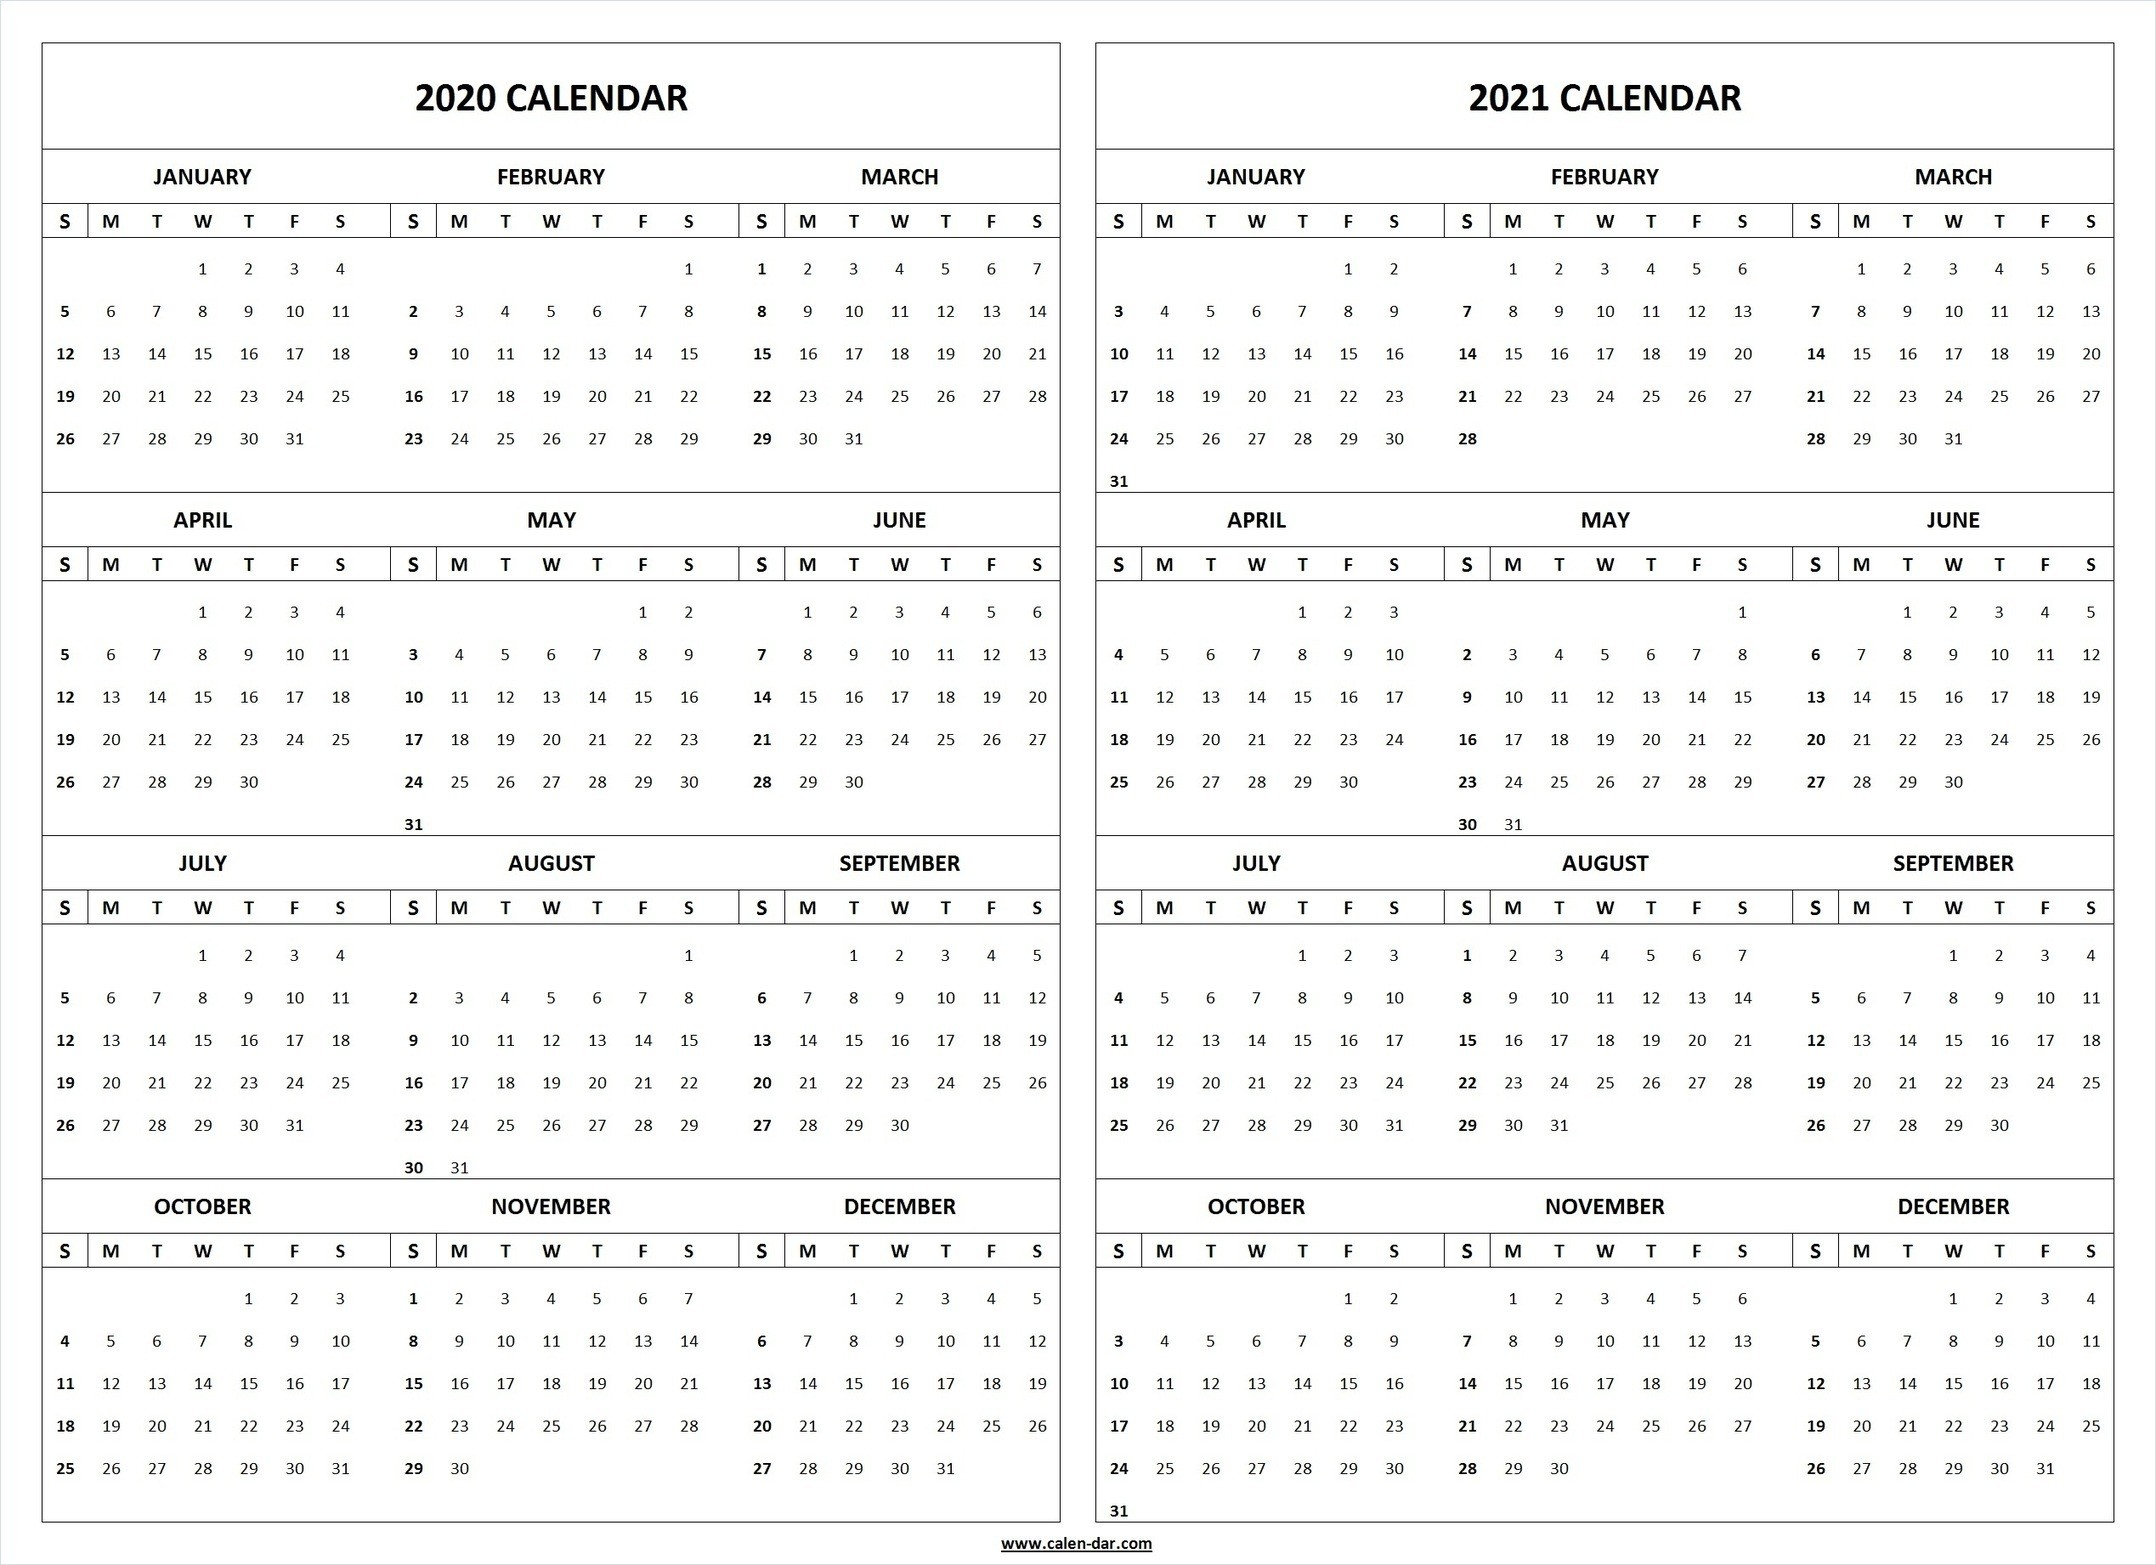 2020 2021 Calendar Printable Template